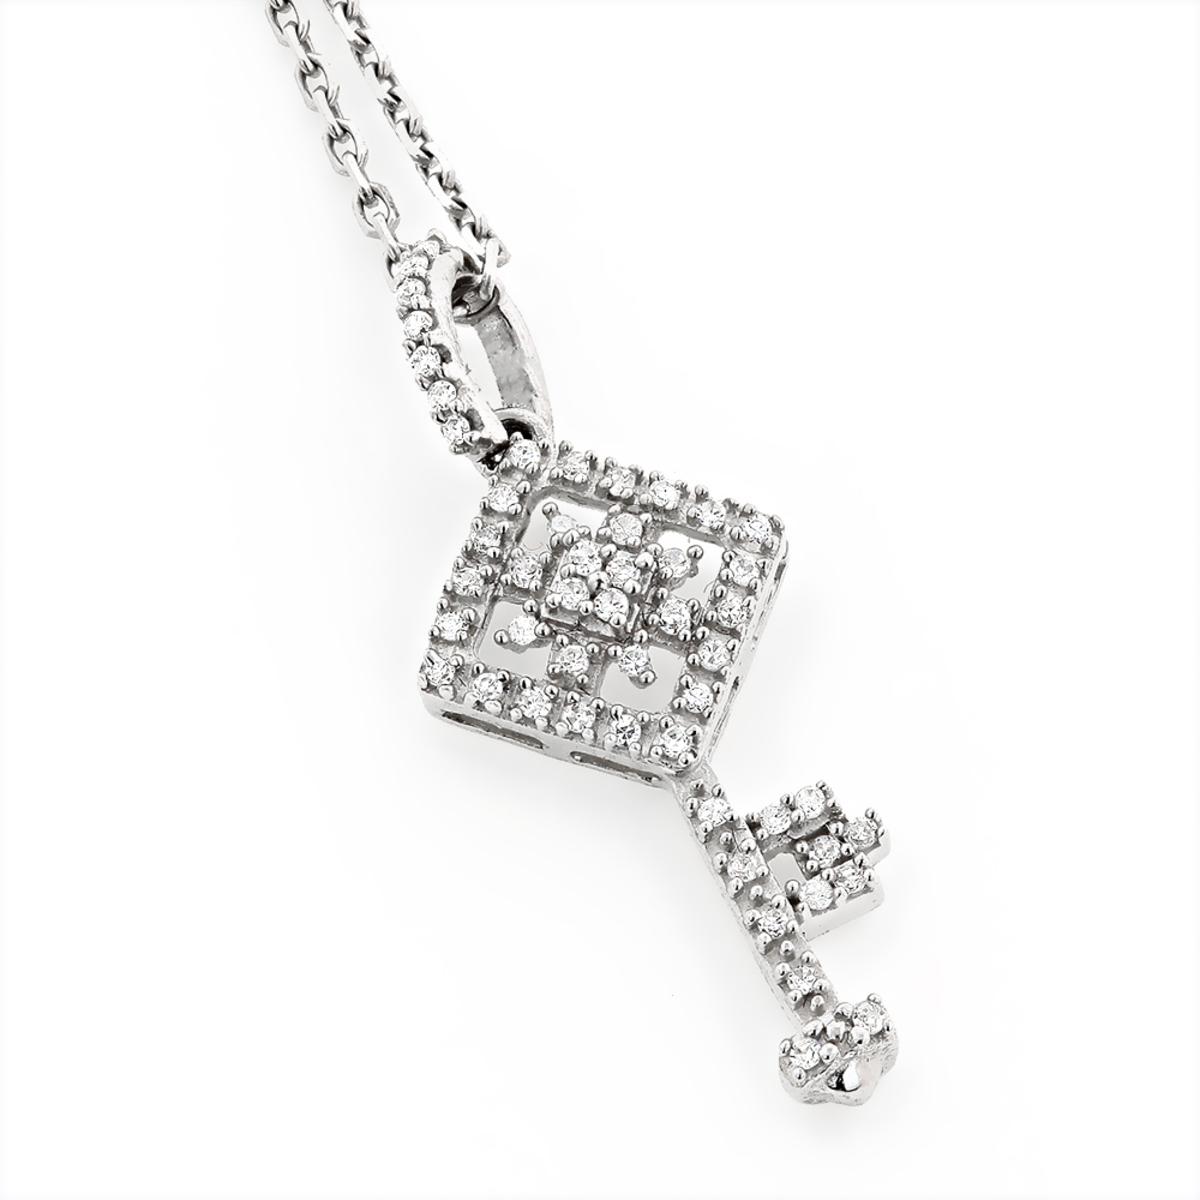 Small Diamond Key Necklace 0.18ct 14k Gold